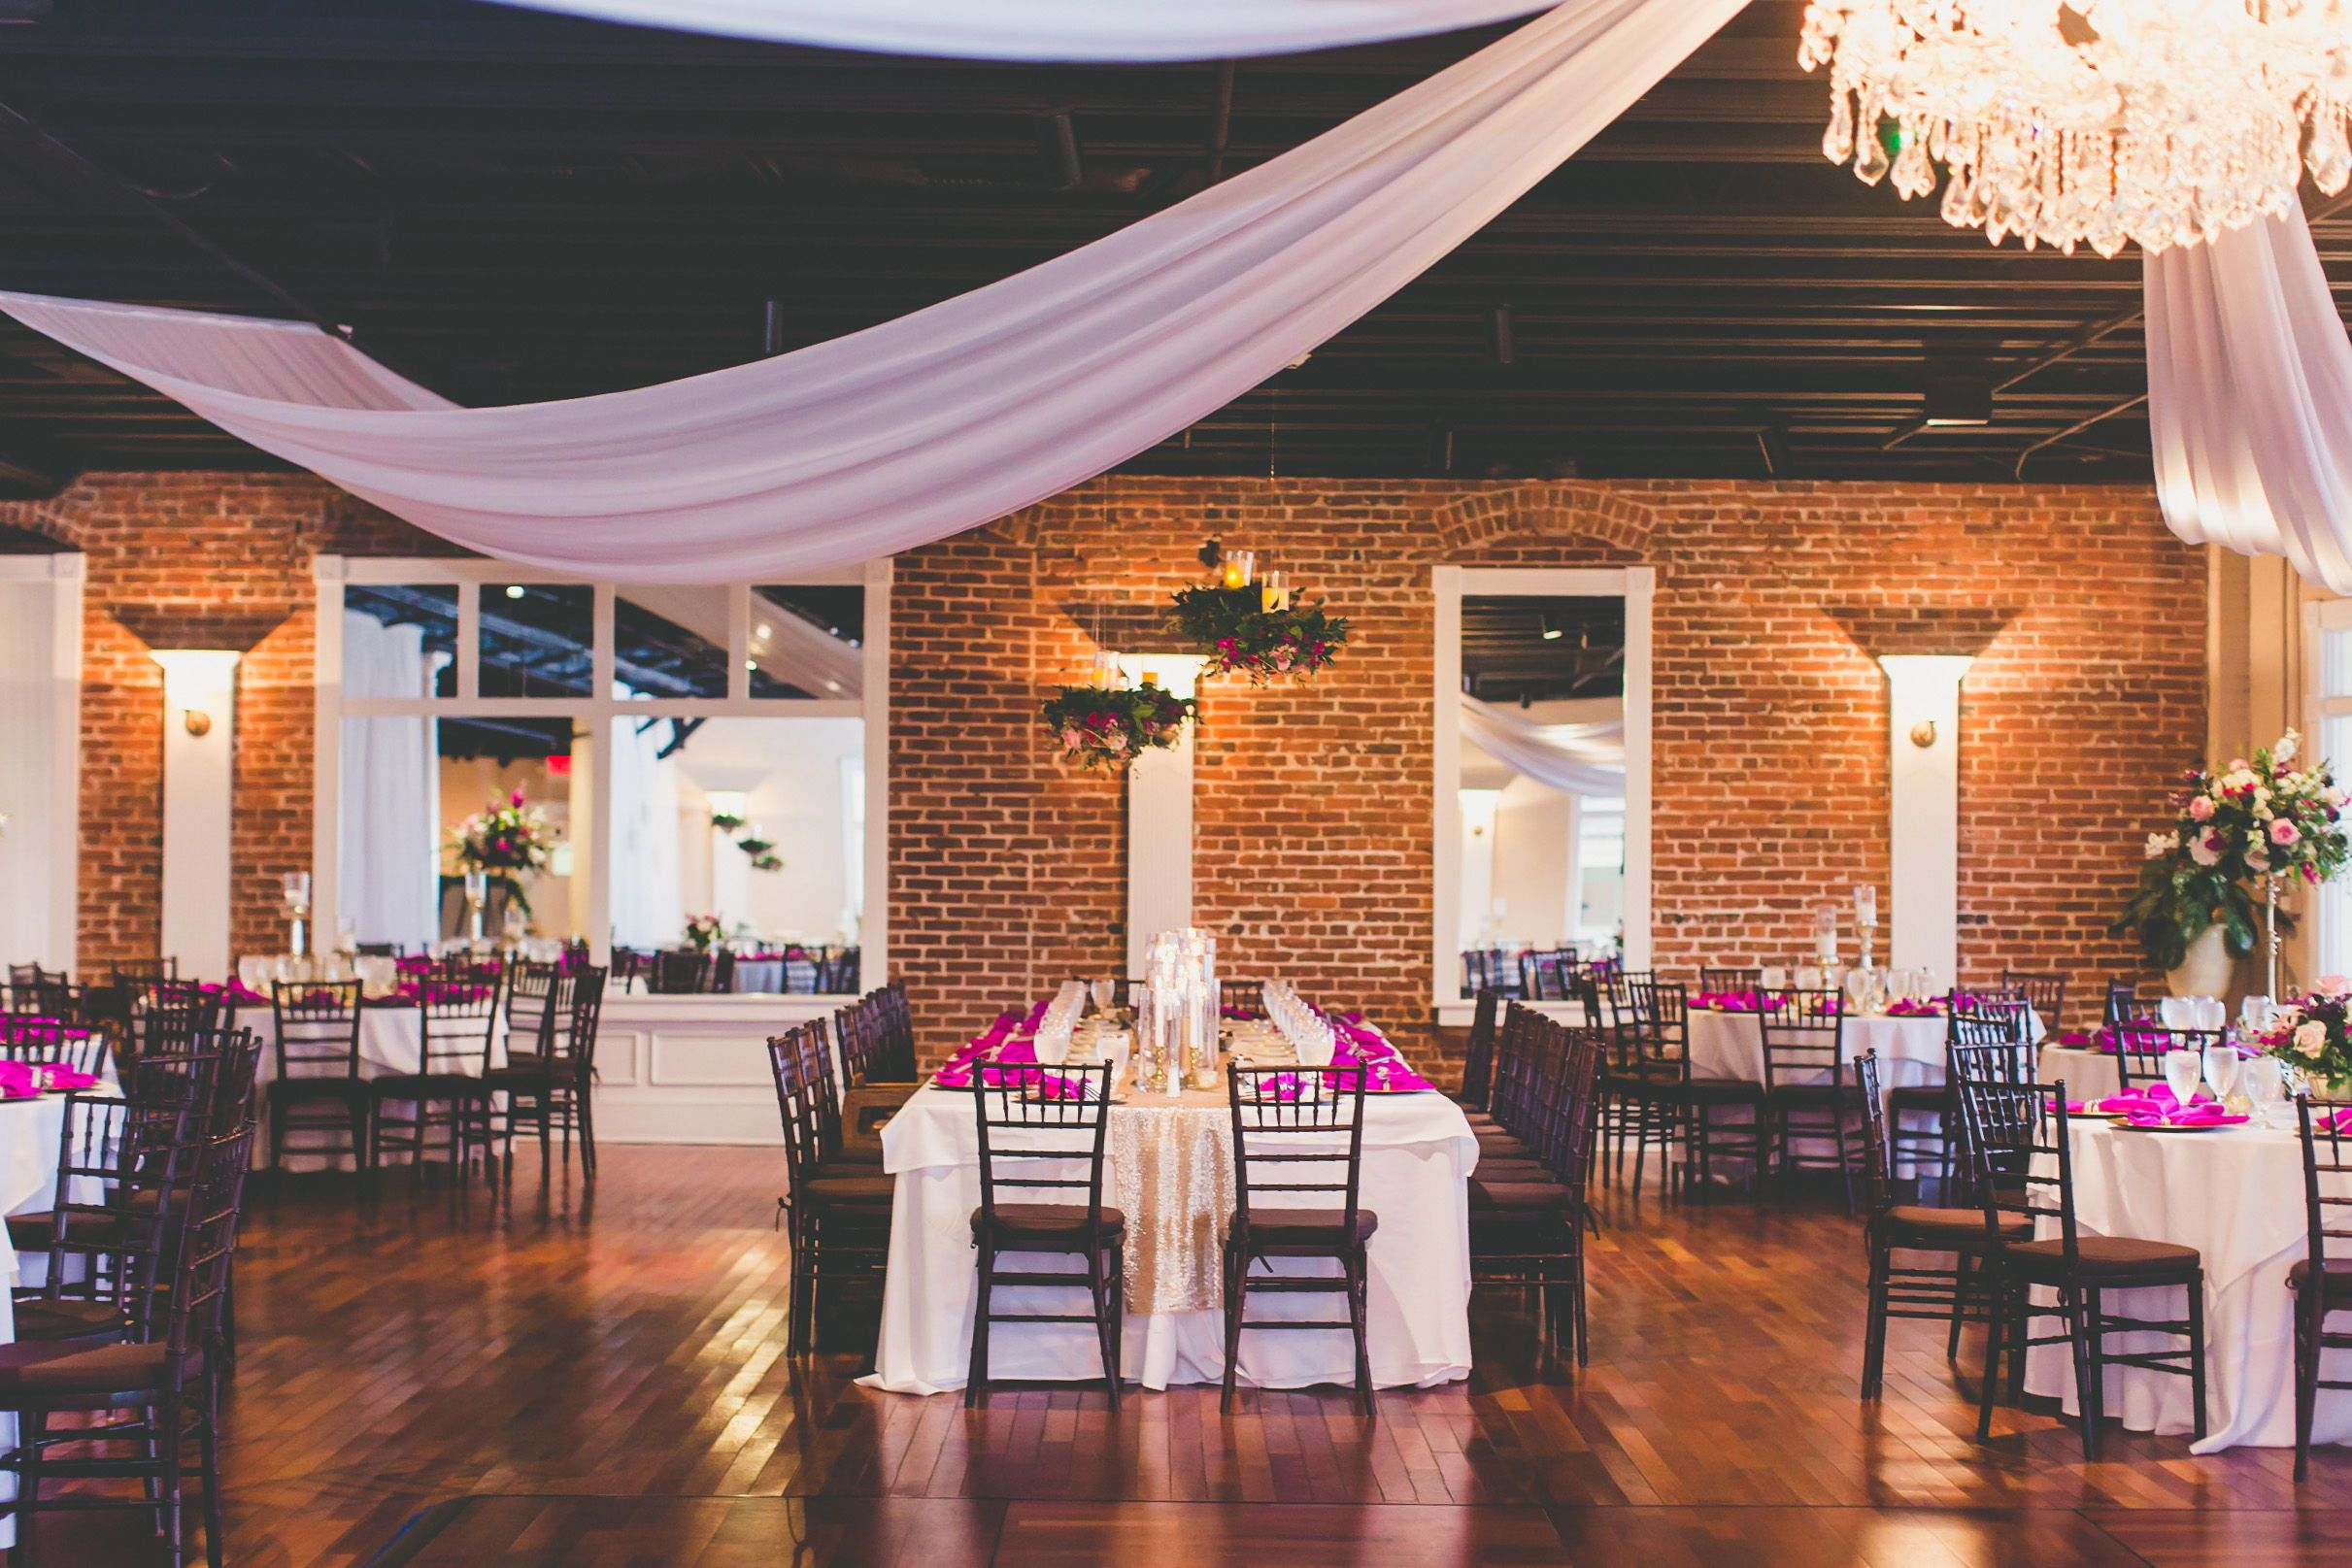 Wedding venue decoration images  Jade Violet Wedding u Floral  Wedding Reception Decor Inspiration